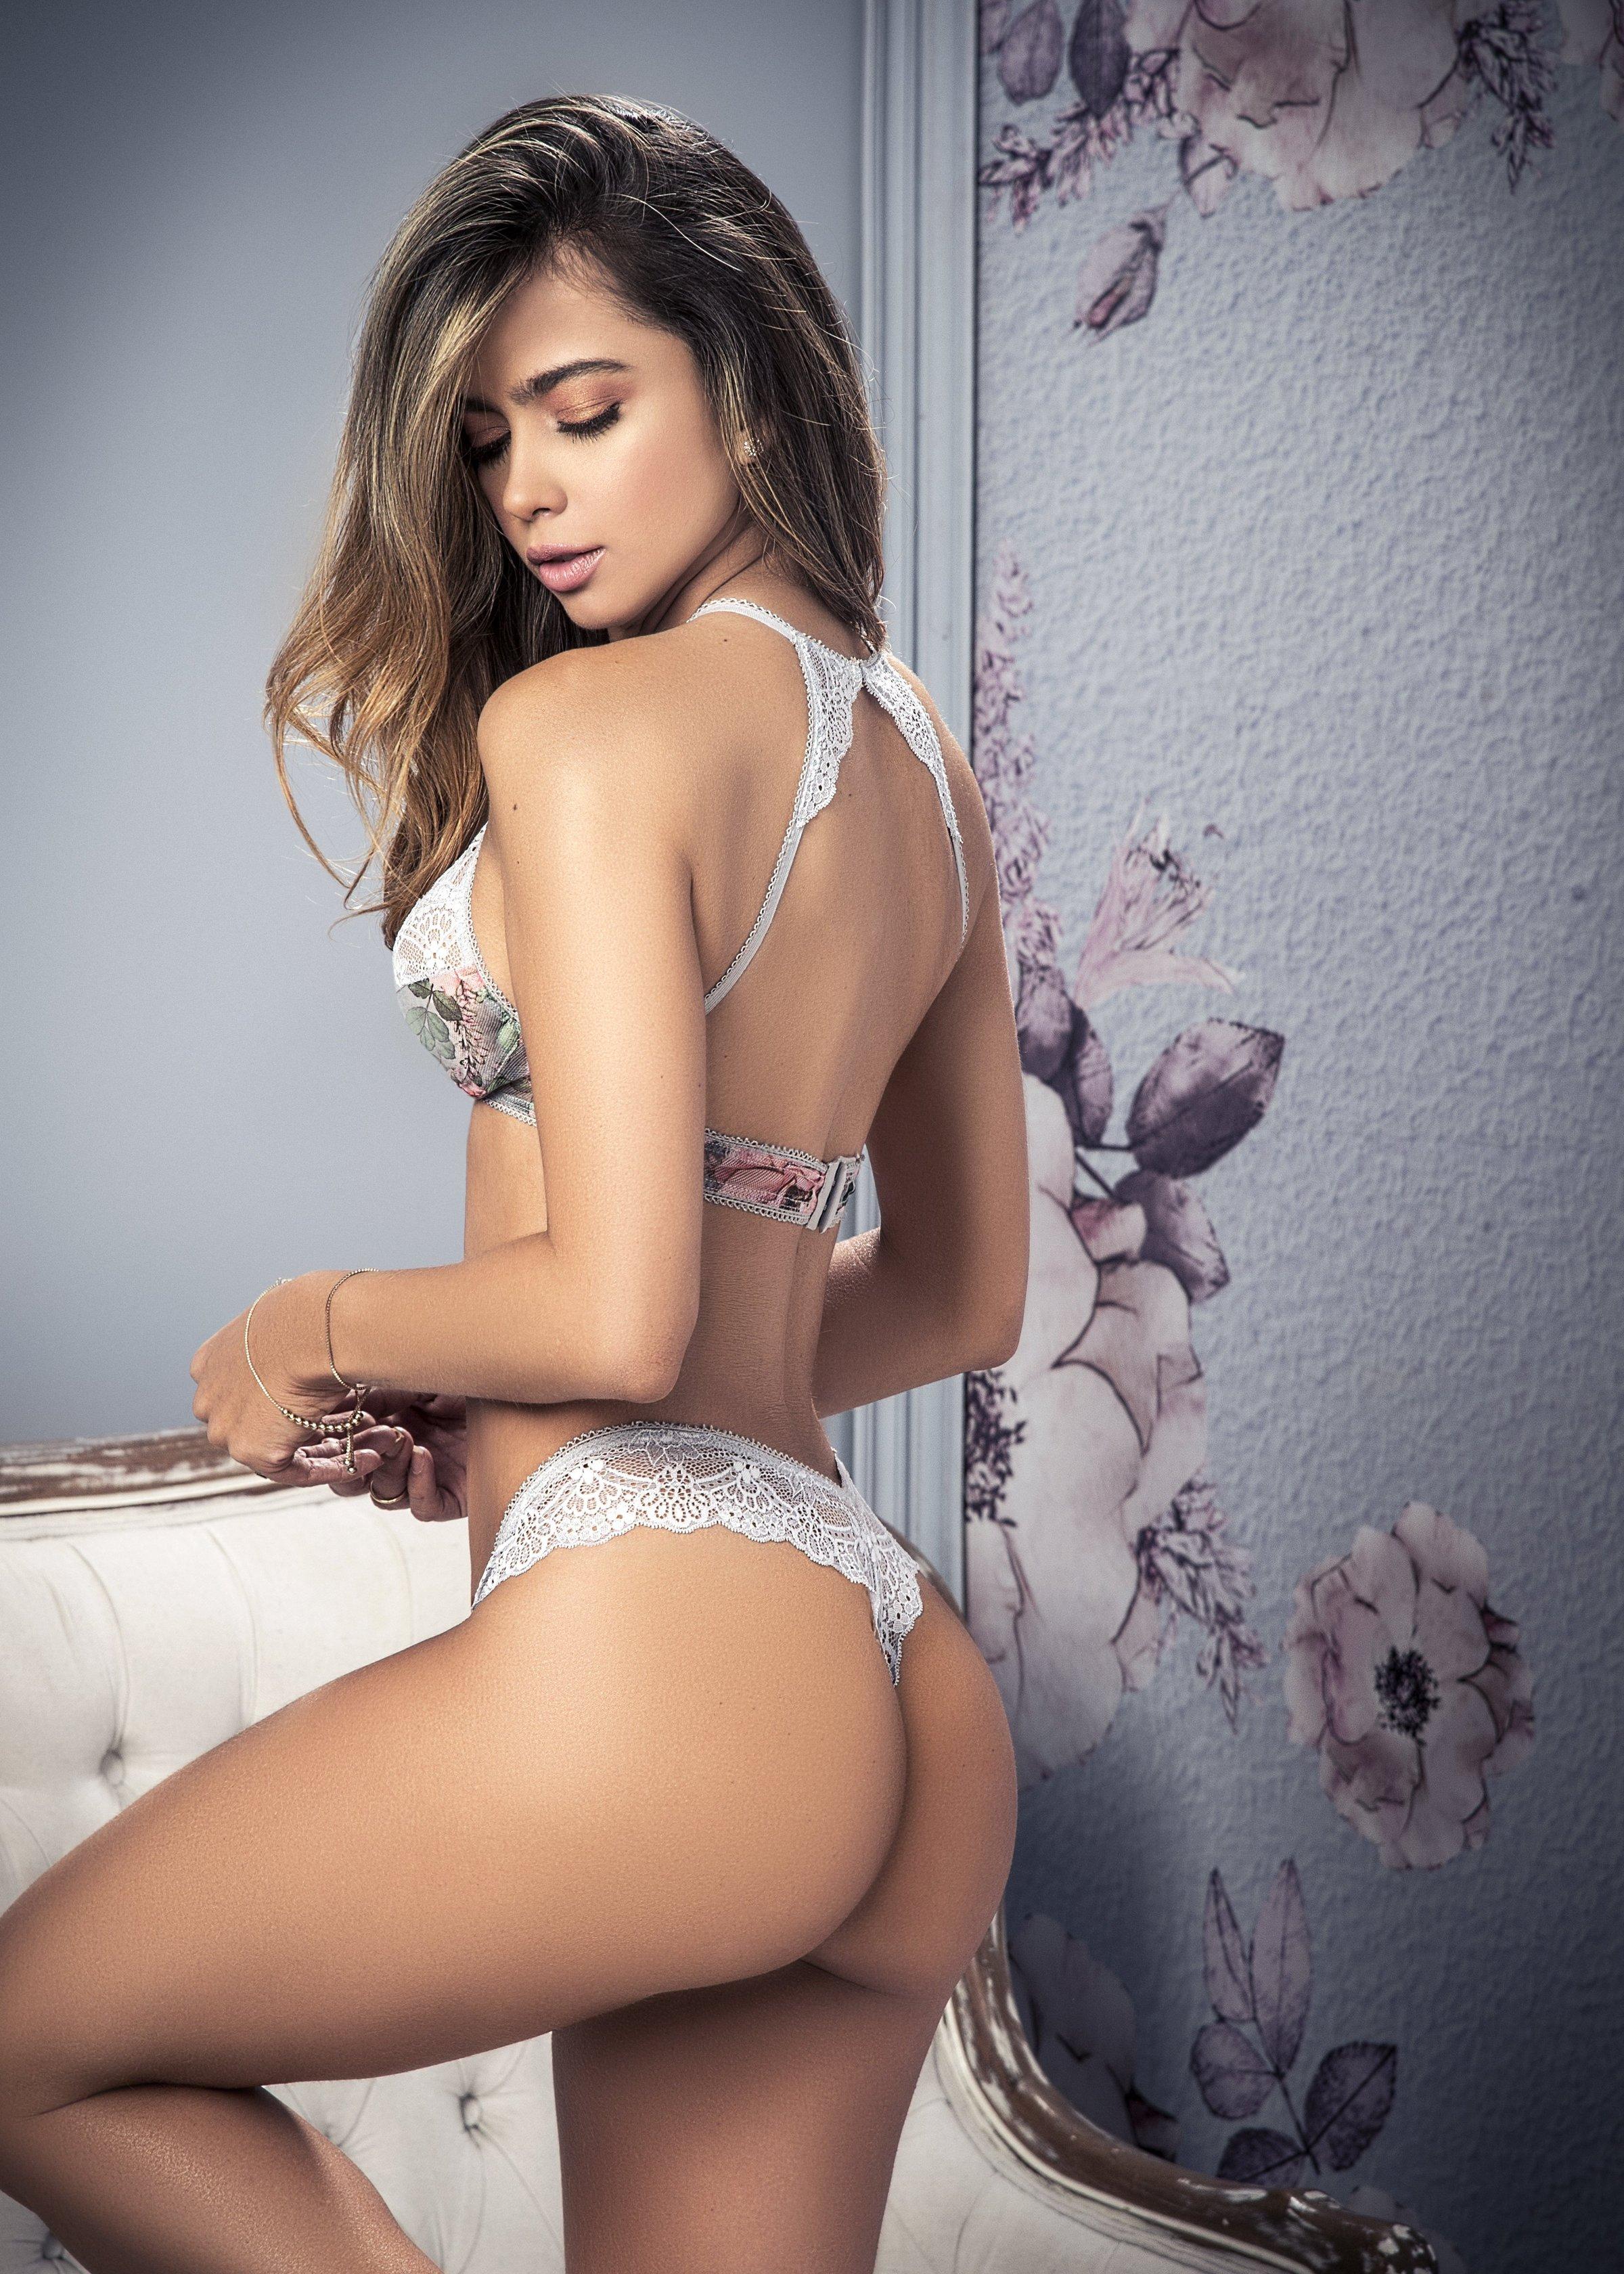 hot beautiful model's back